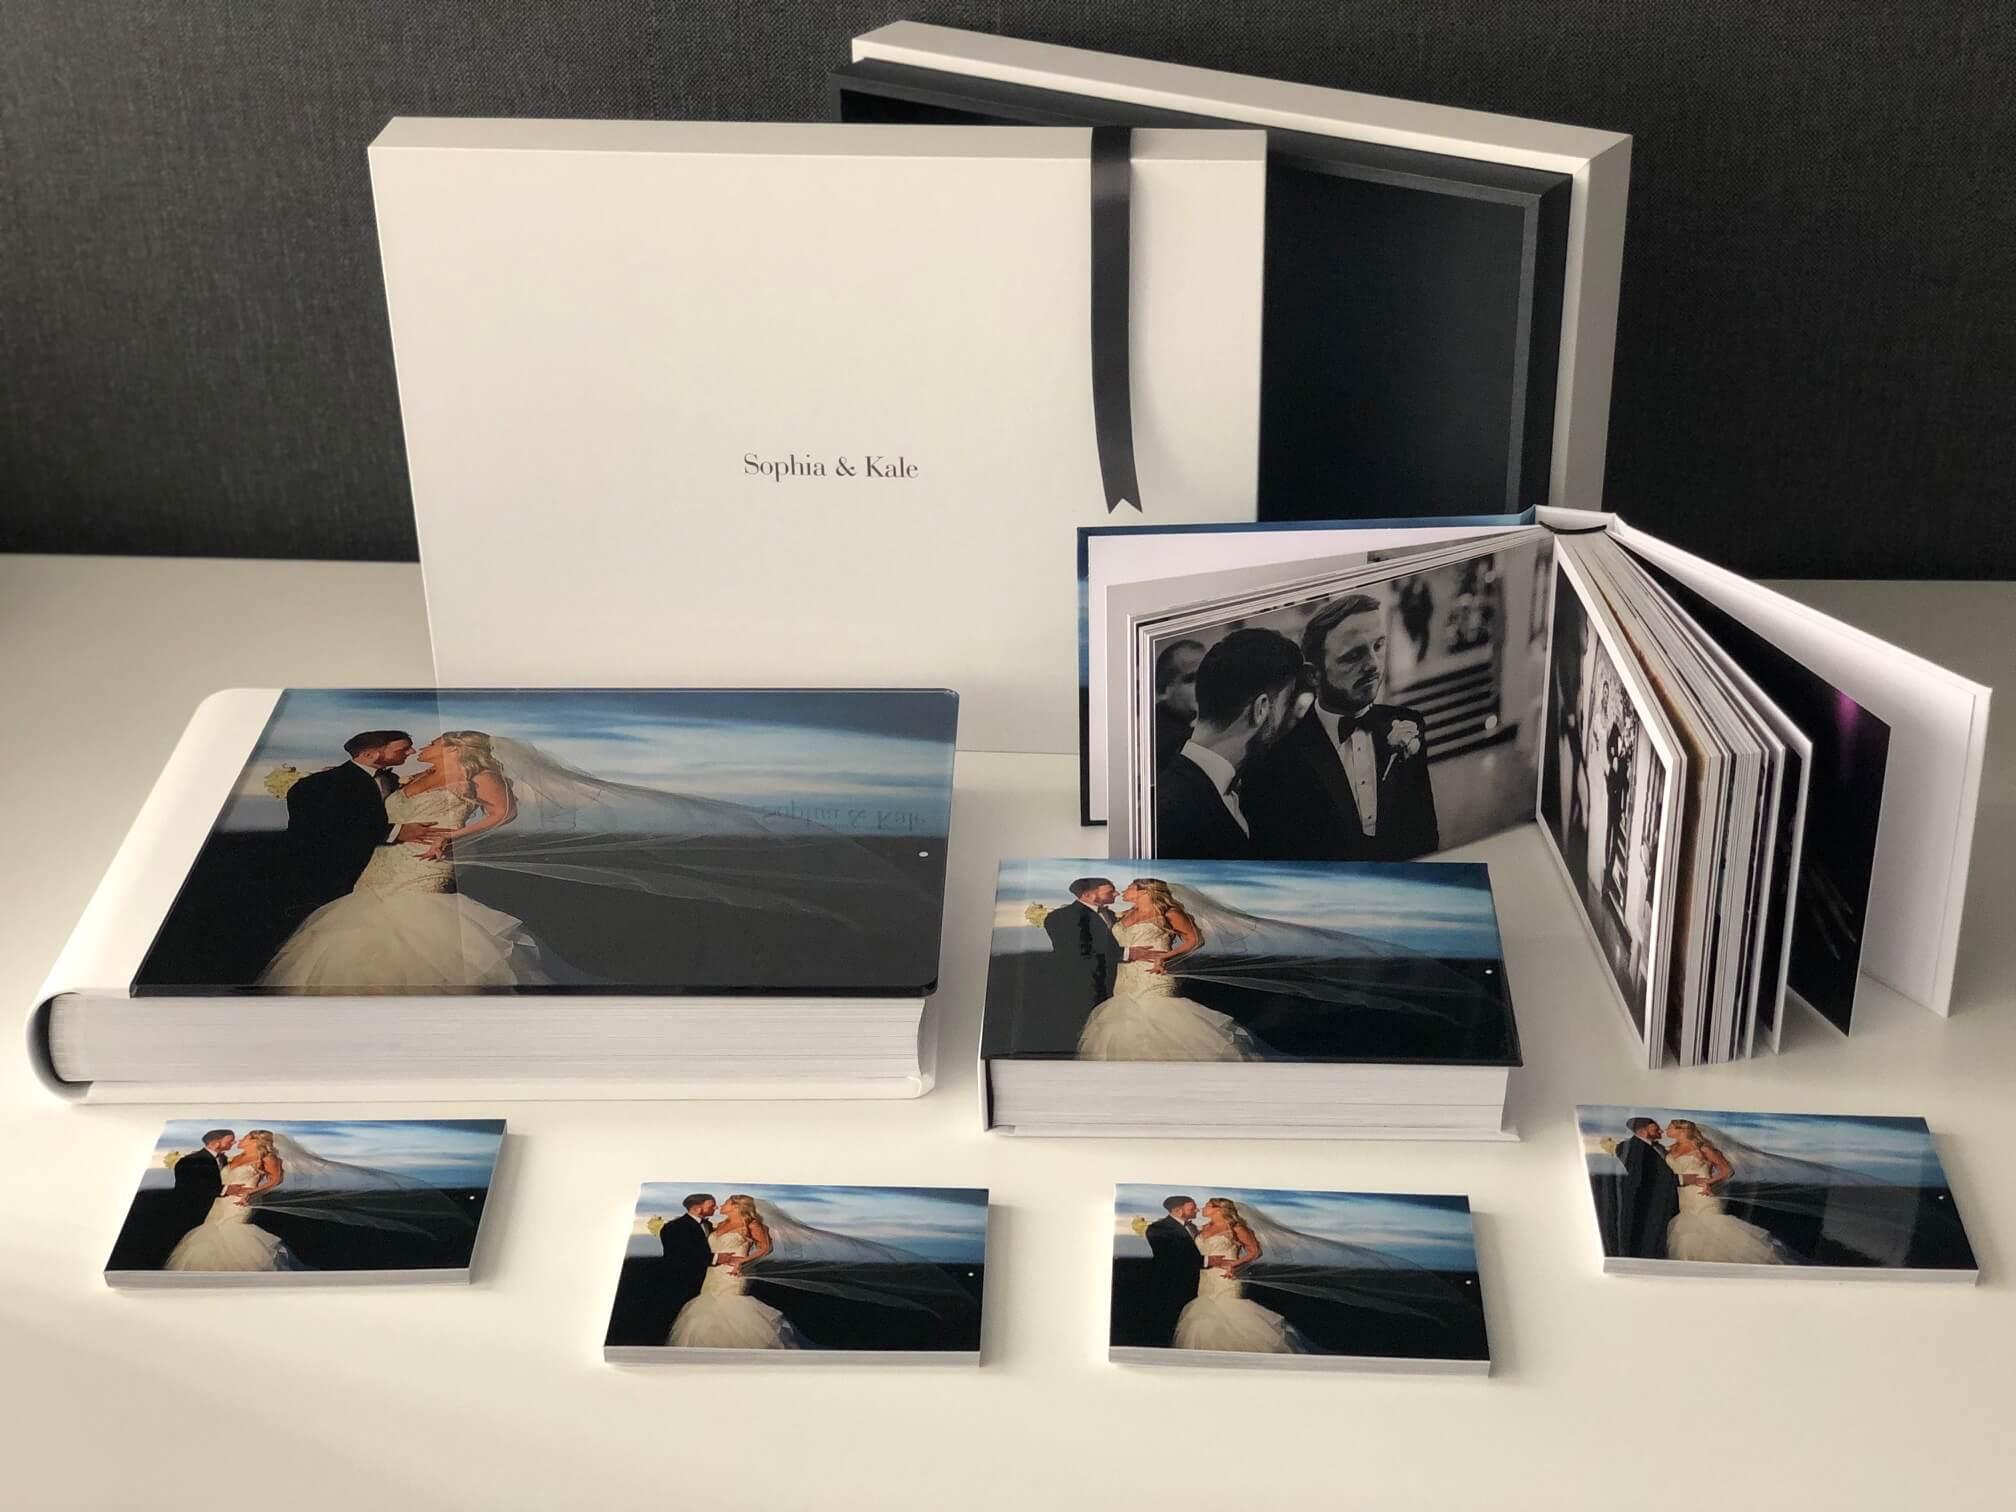 Storybook wedding album collection